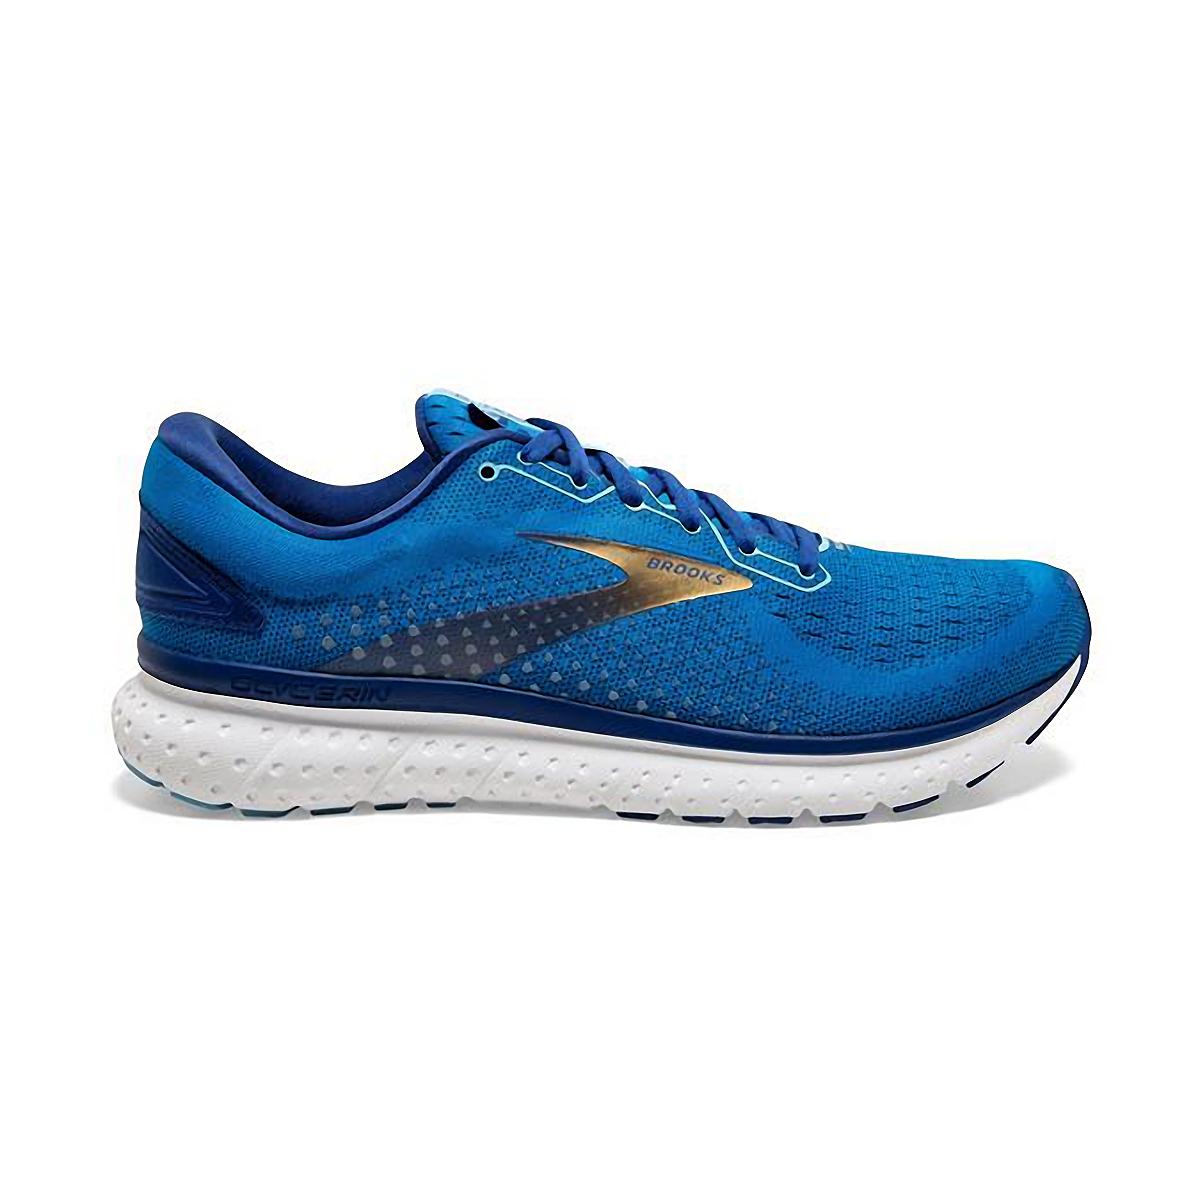 Men's Brooks Glycerin 18 Running Shoe - Color: Blue/Marazine/Gold - Size: 7 - Width: Regular, Blue/Marazine/Gold, large, image 1